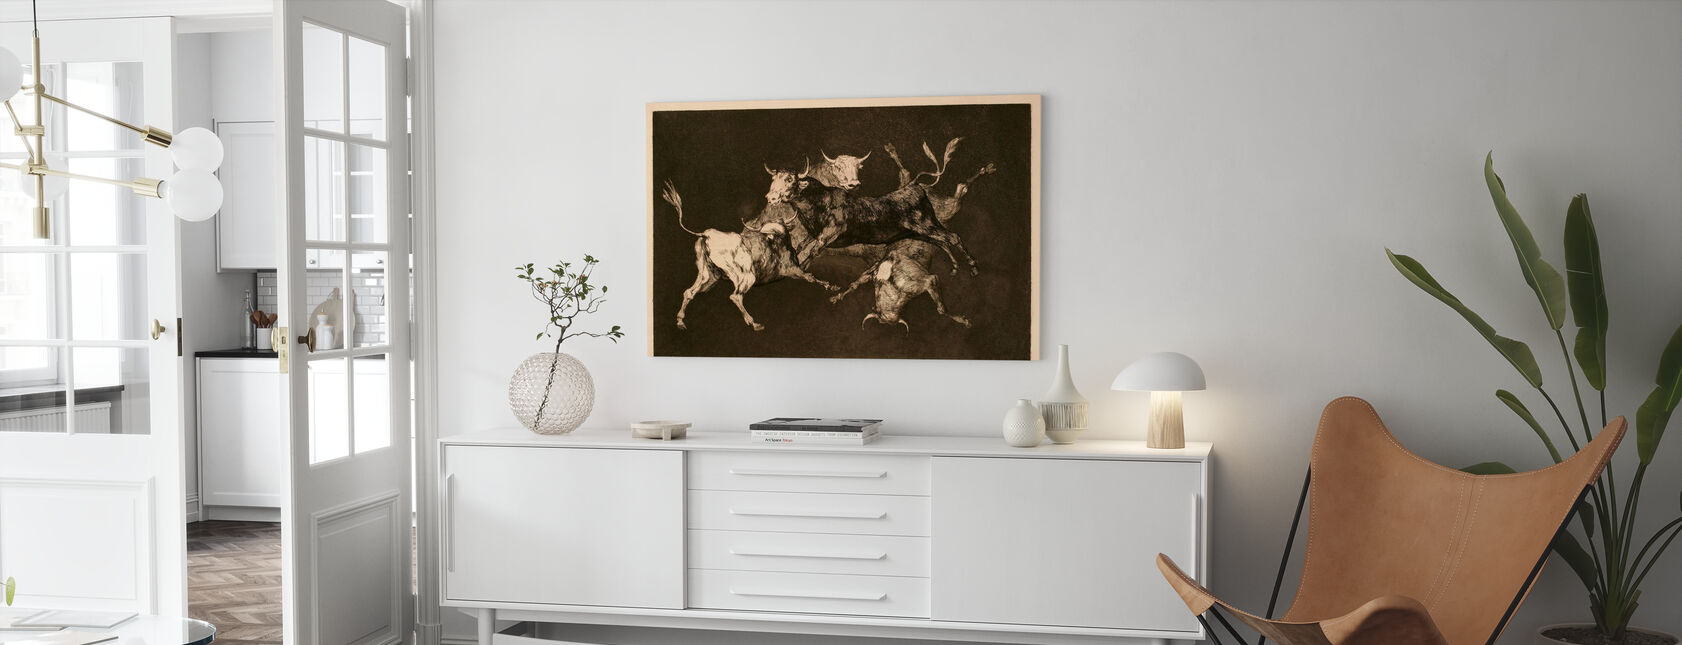 Francisco De Goya And Lucientes - Infographics - Canvas print - Living Room